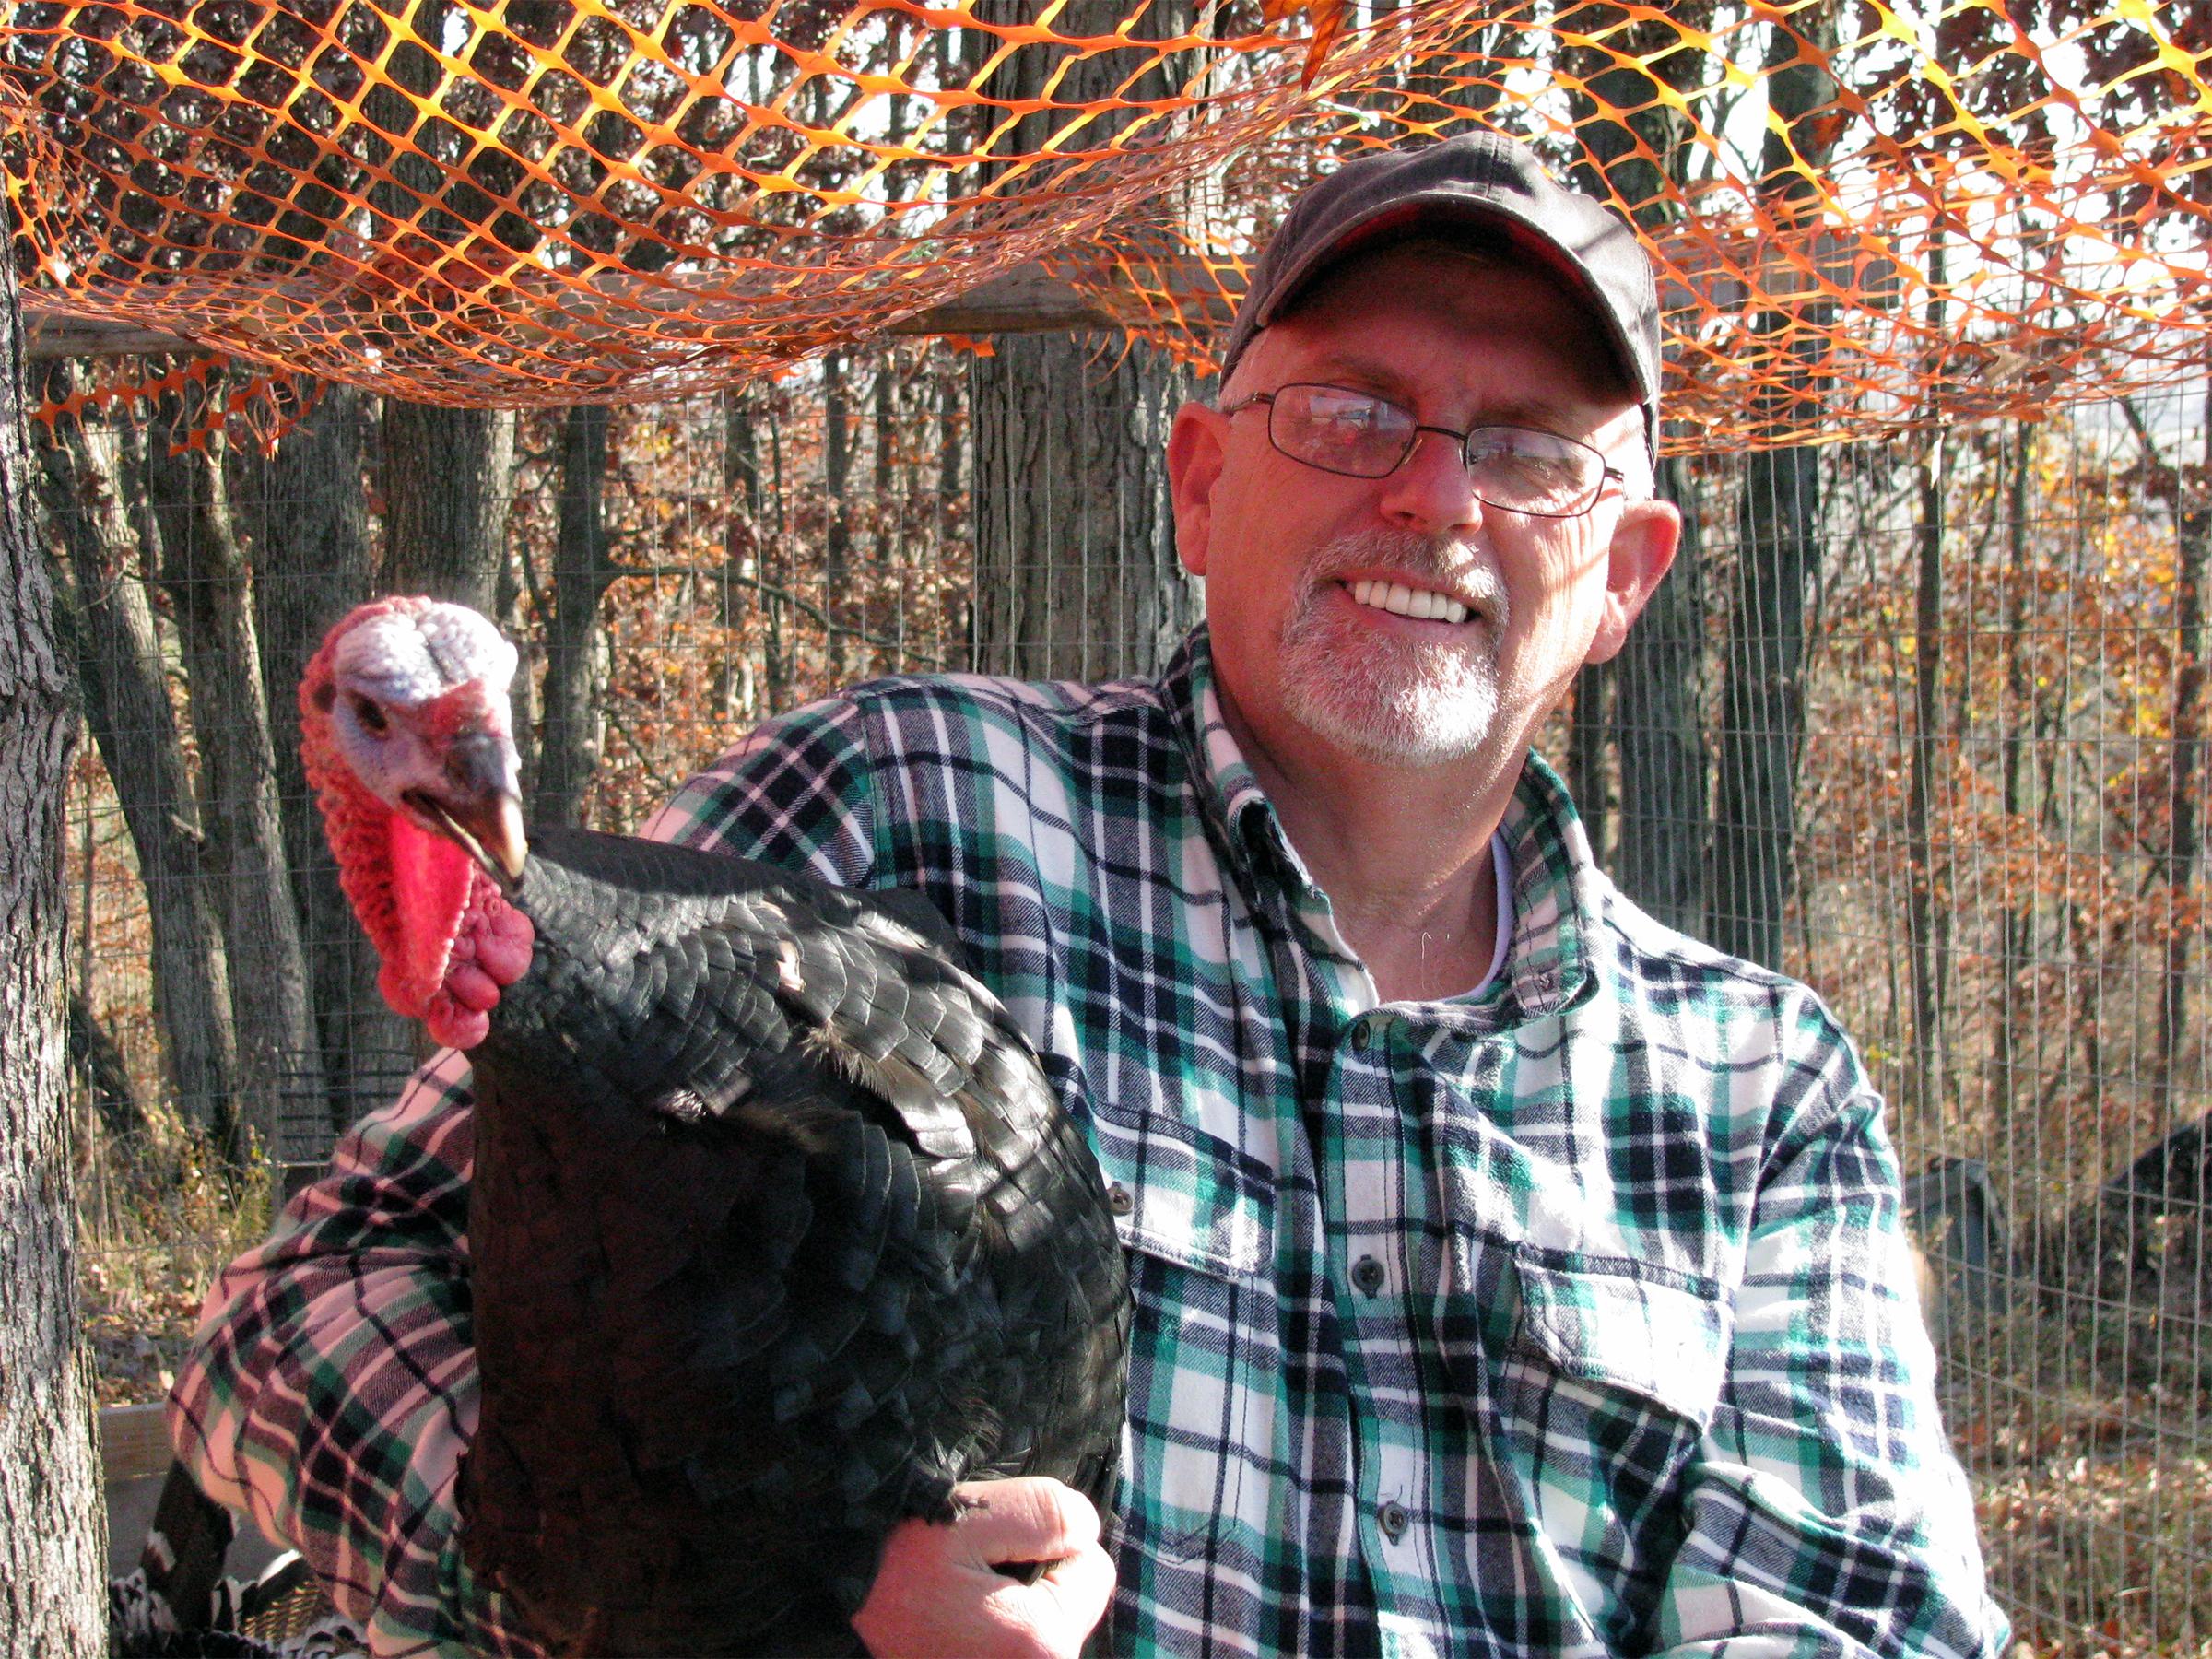 Rod Belzer raises heritage turkeys at Winigan Farms in Sullivan County, Mo.